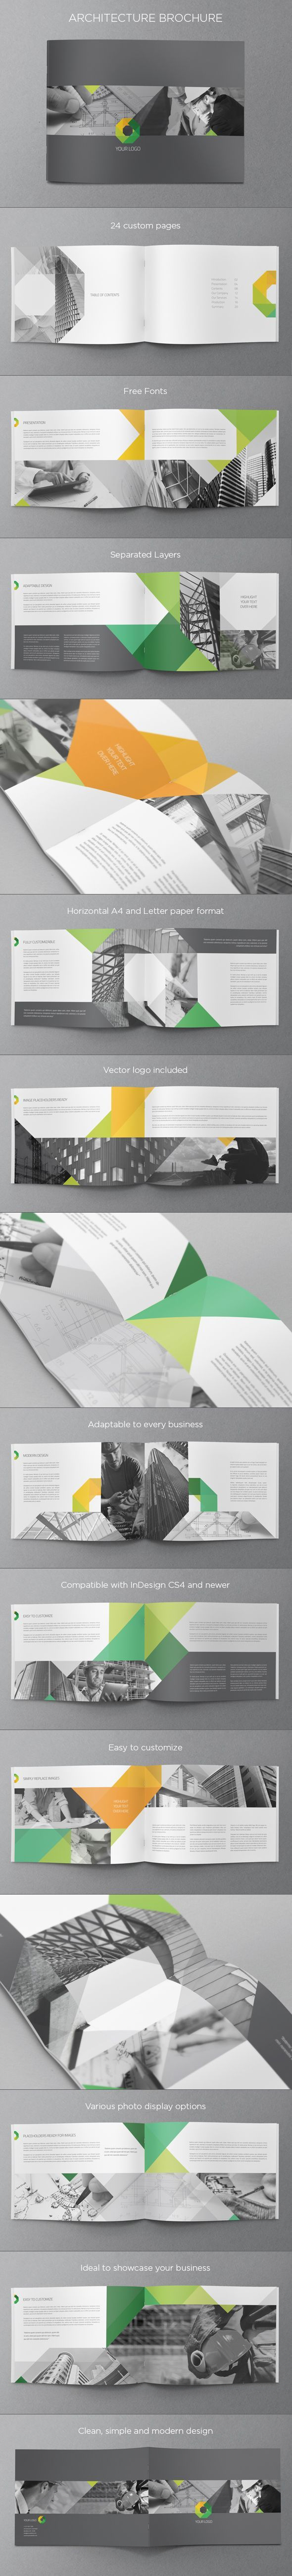 Architecture Brochure. Download here: http://graphicriver.net/item/modern-architecture-brochure/5478285 #design #brochure: